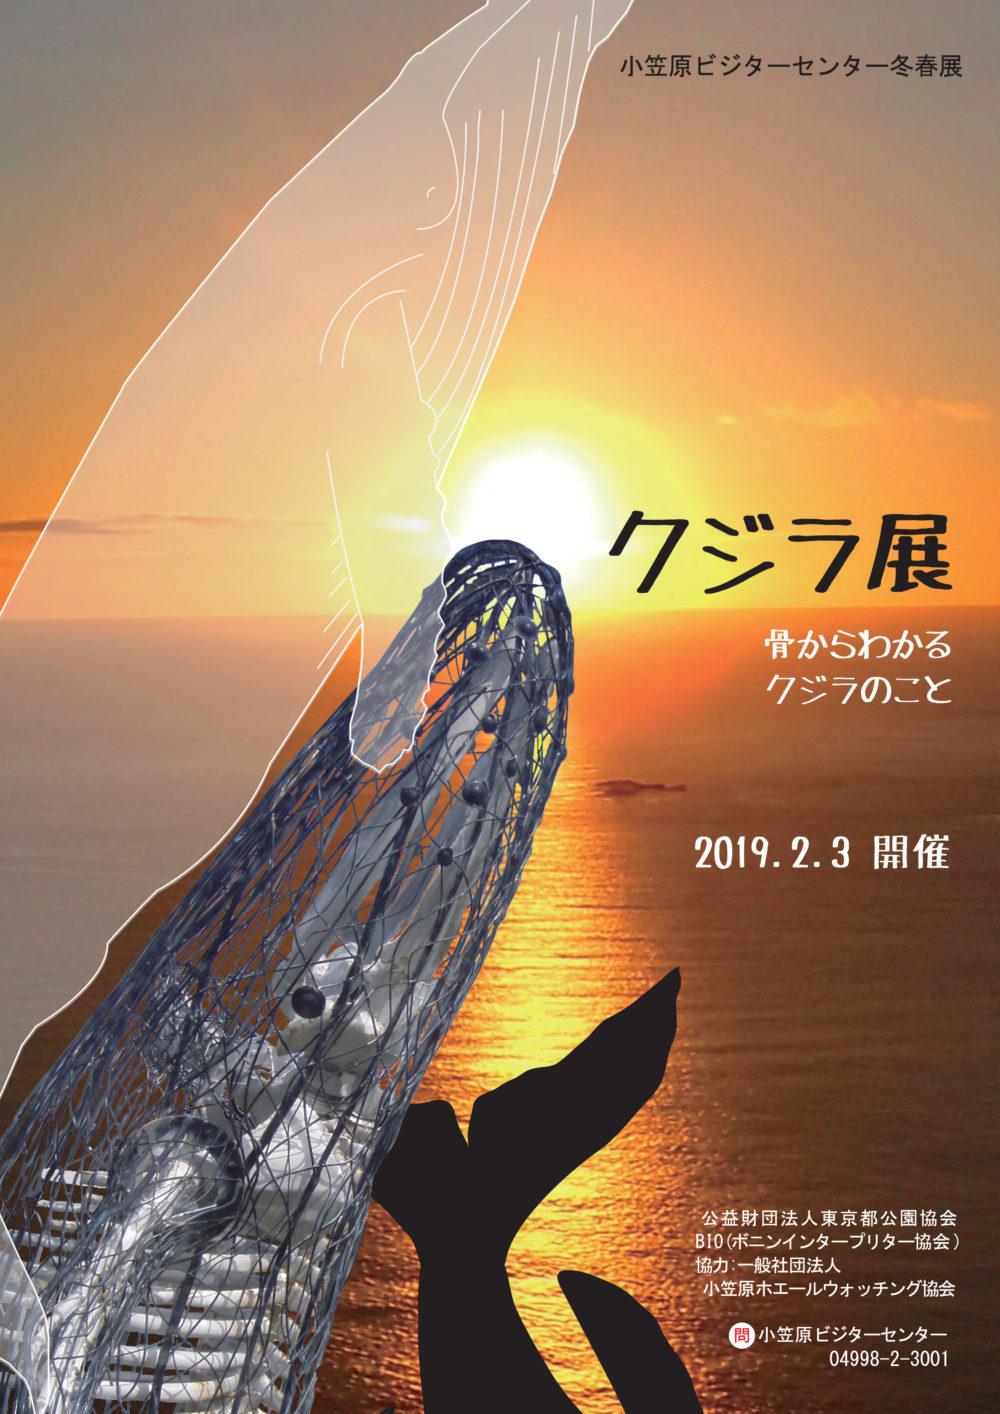 ザトウクジラ01